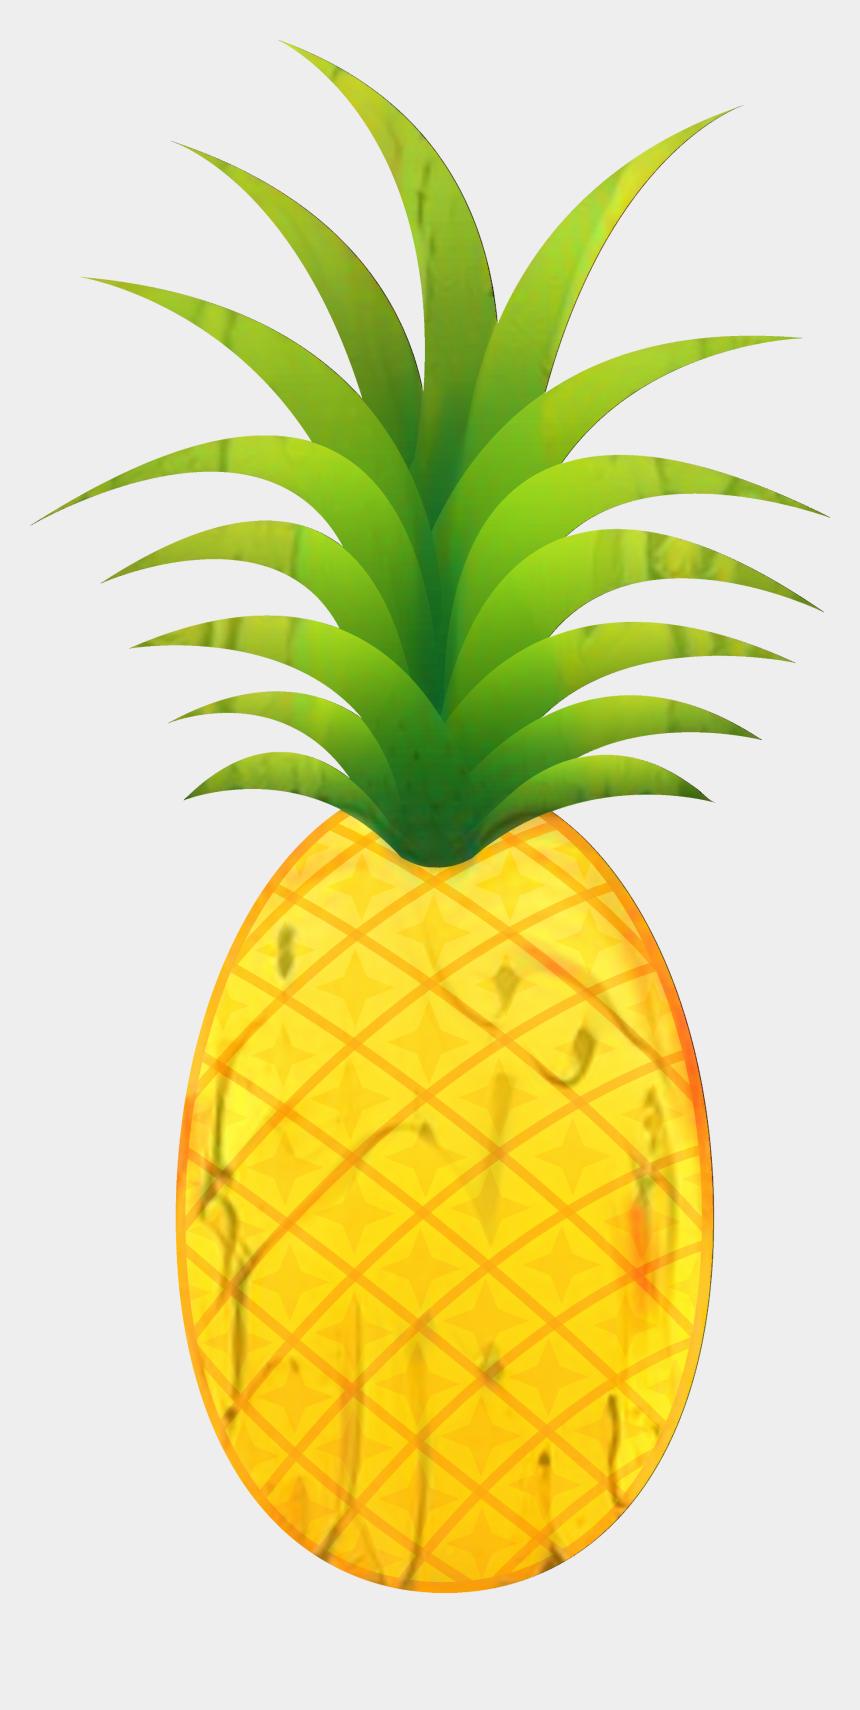 luau clipart transparent background, Cartoons - Pineapple Clip Art Portable Network Graphics Image - Translucent Pineapple Clipart Transparent Background